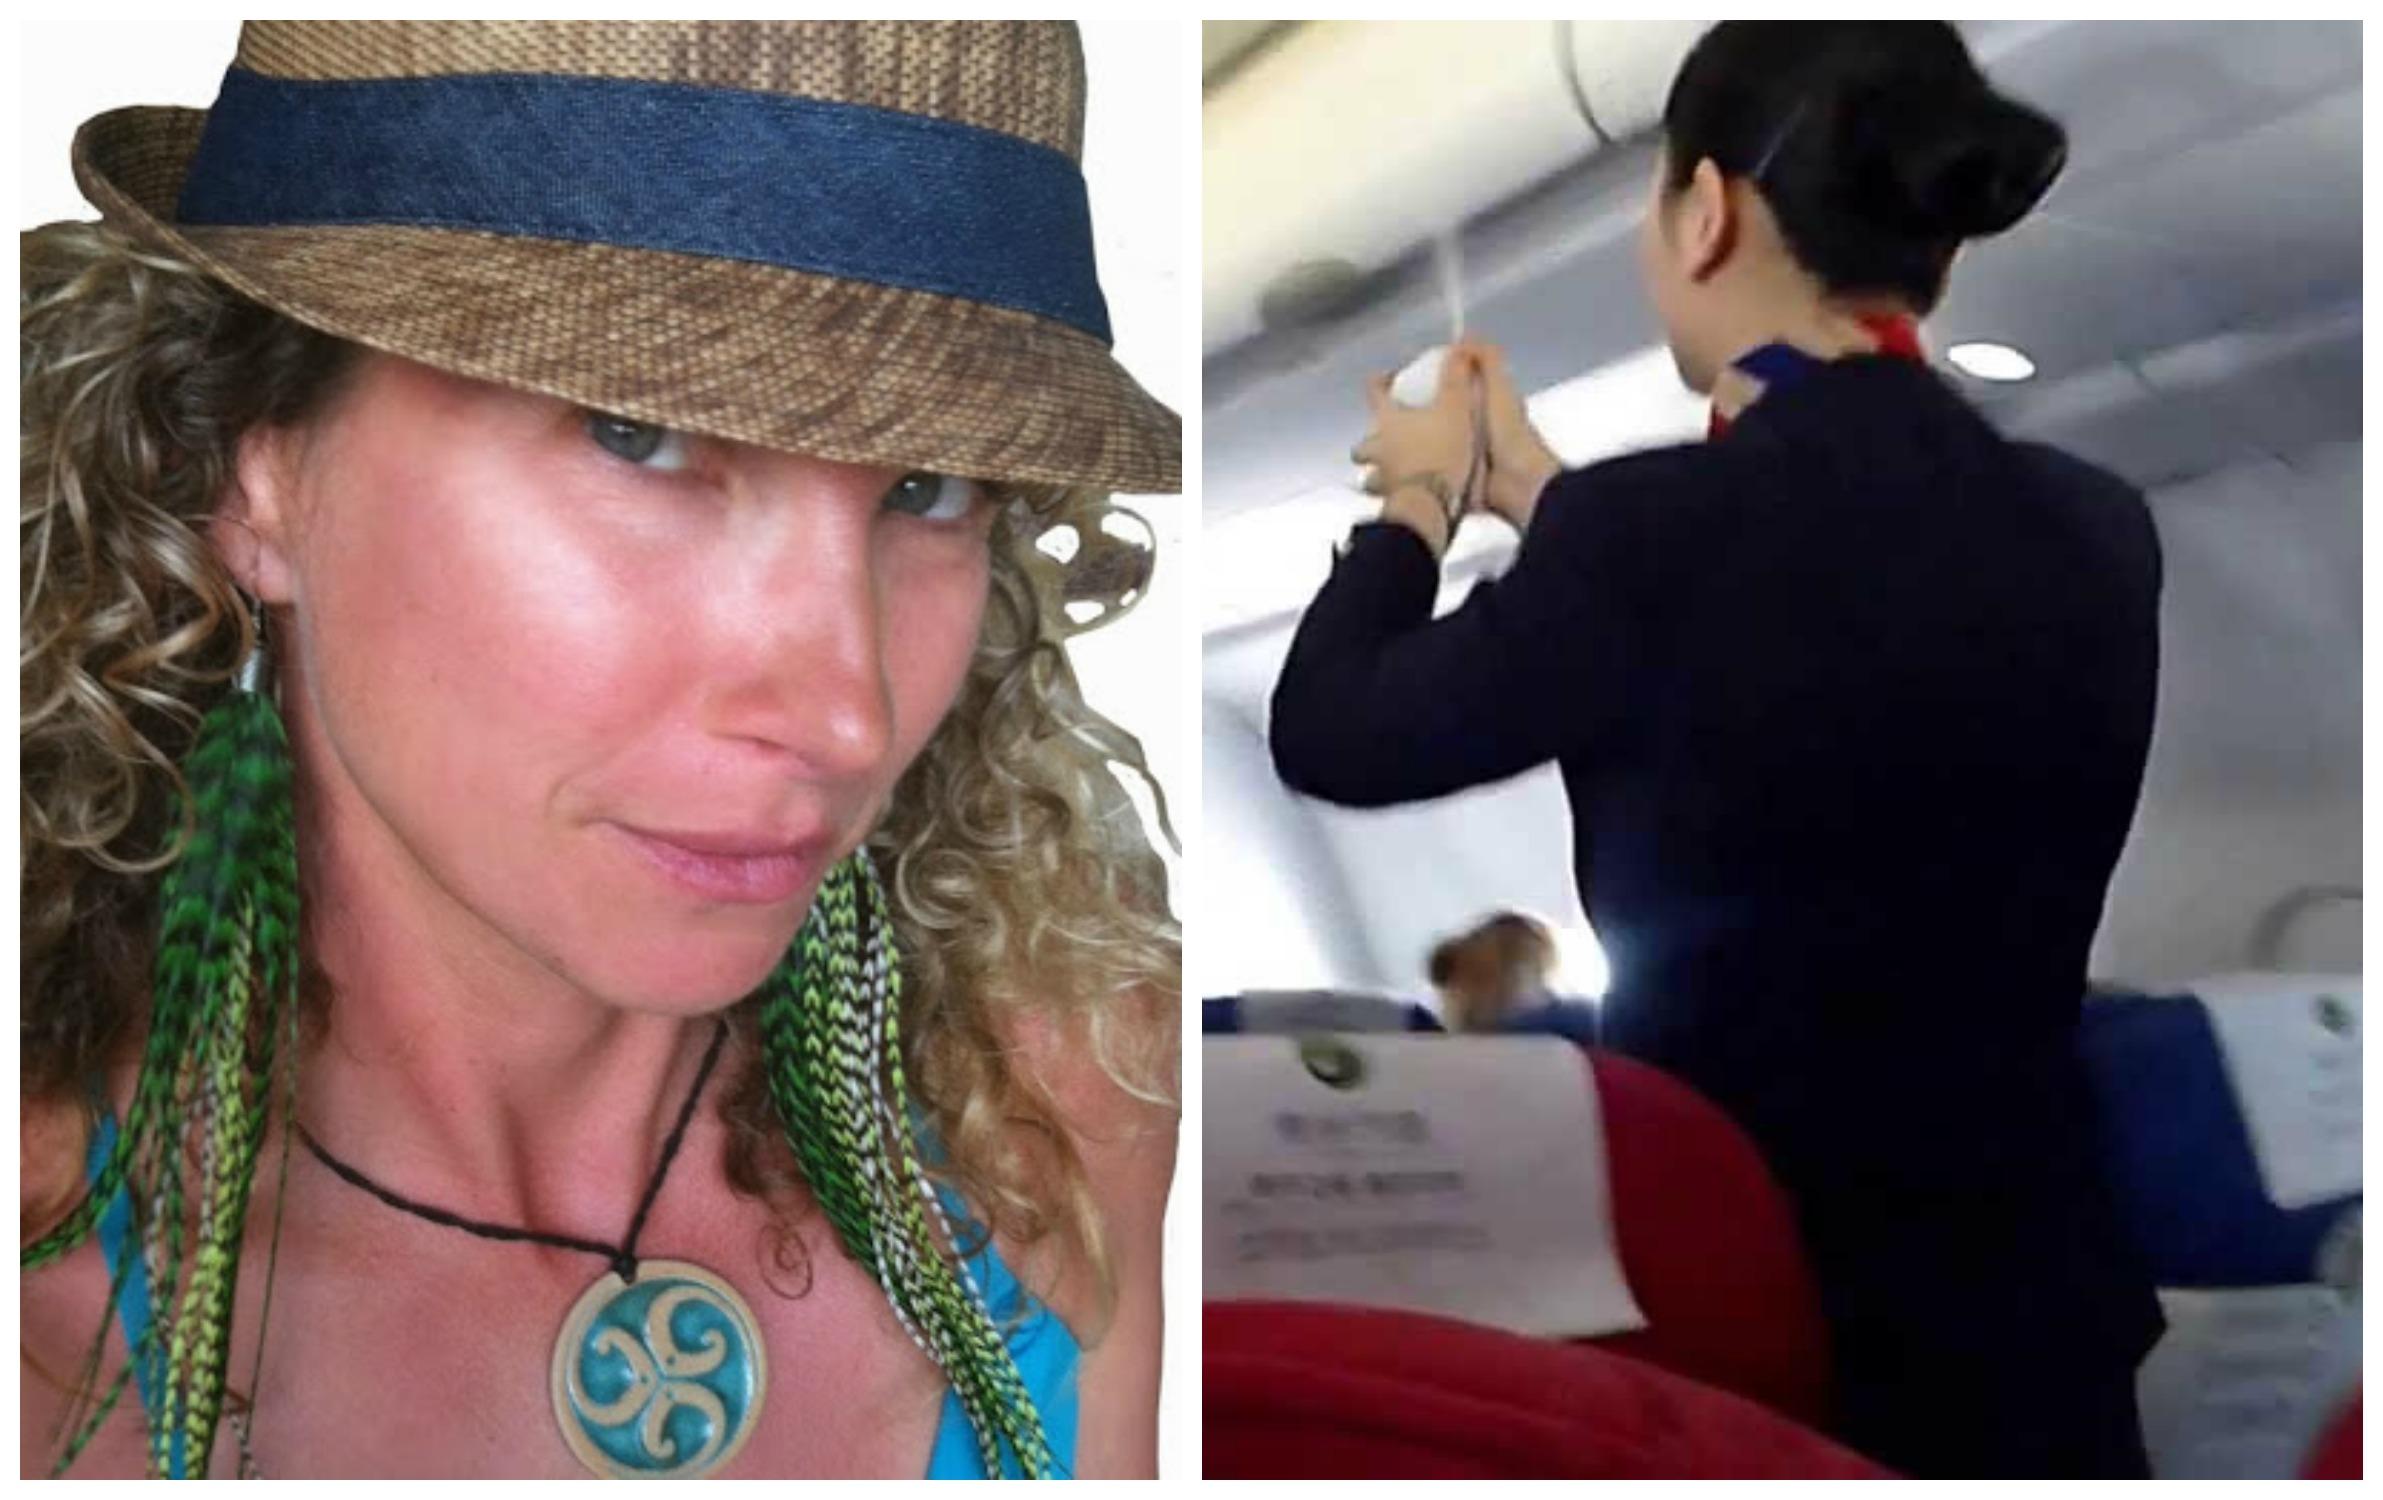 woman sprayed on plane